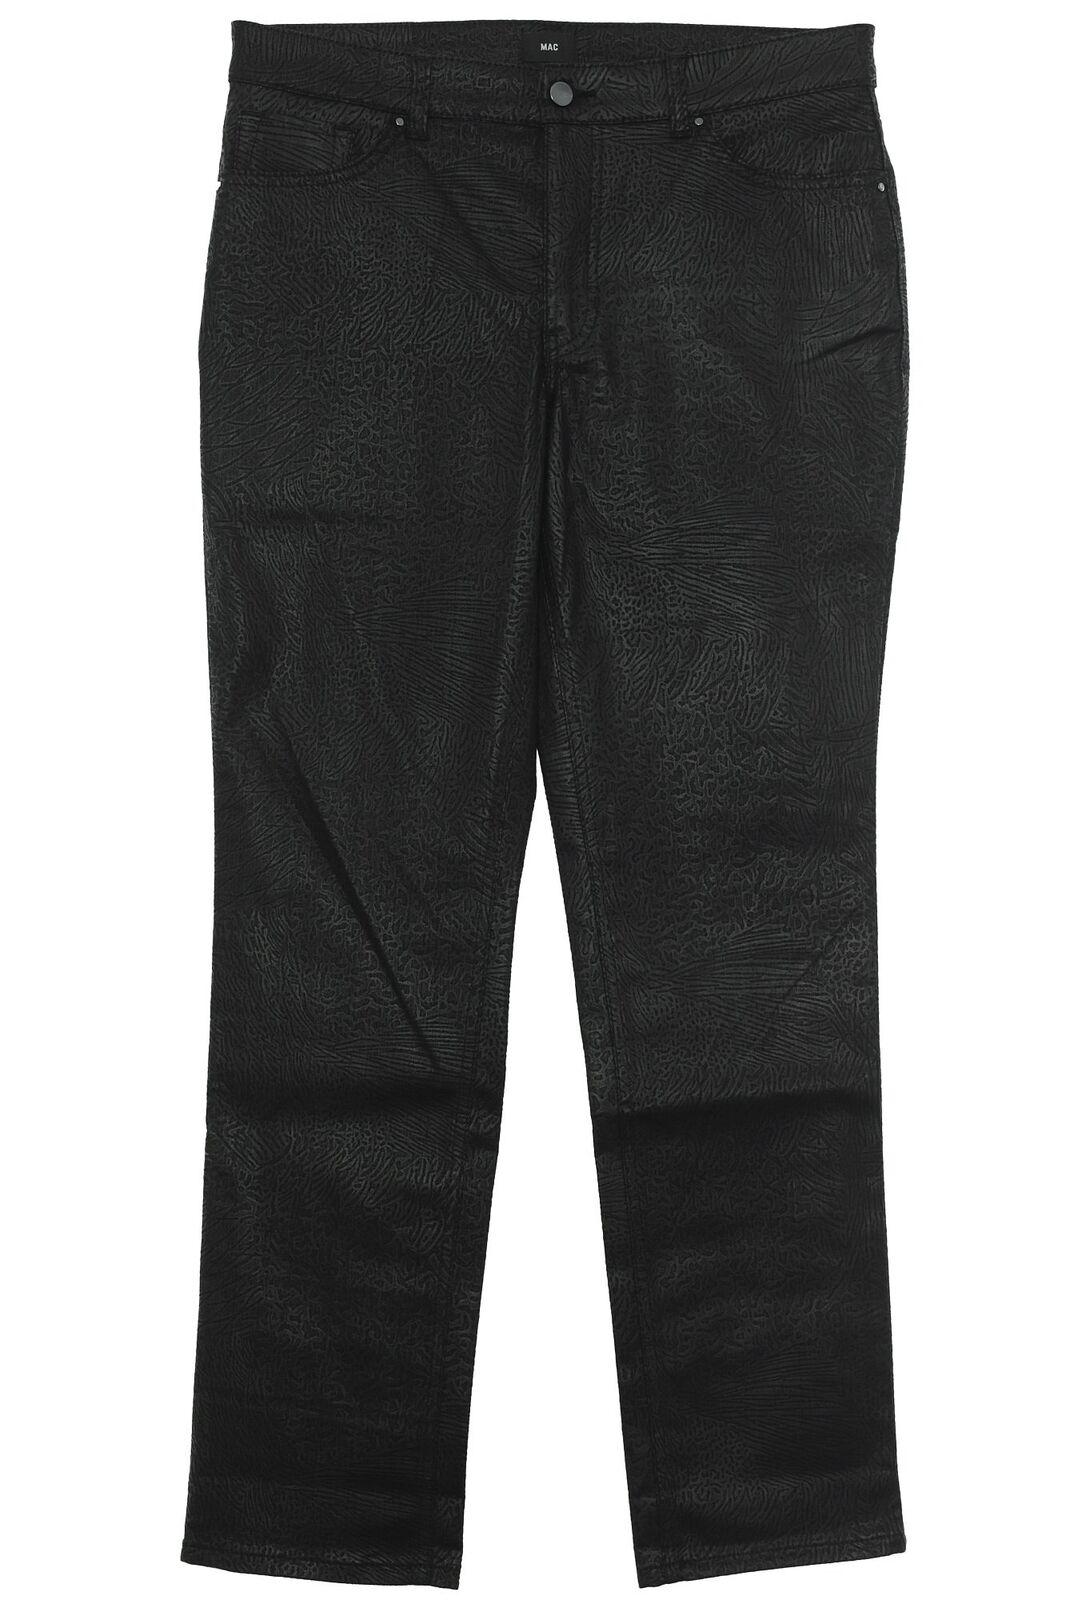 MAC Melanie Jeans Hose Pants Damen Stretch Feminine Fit